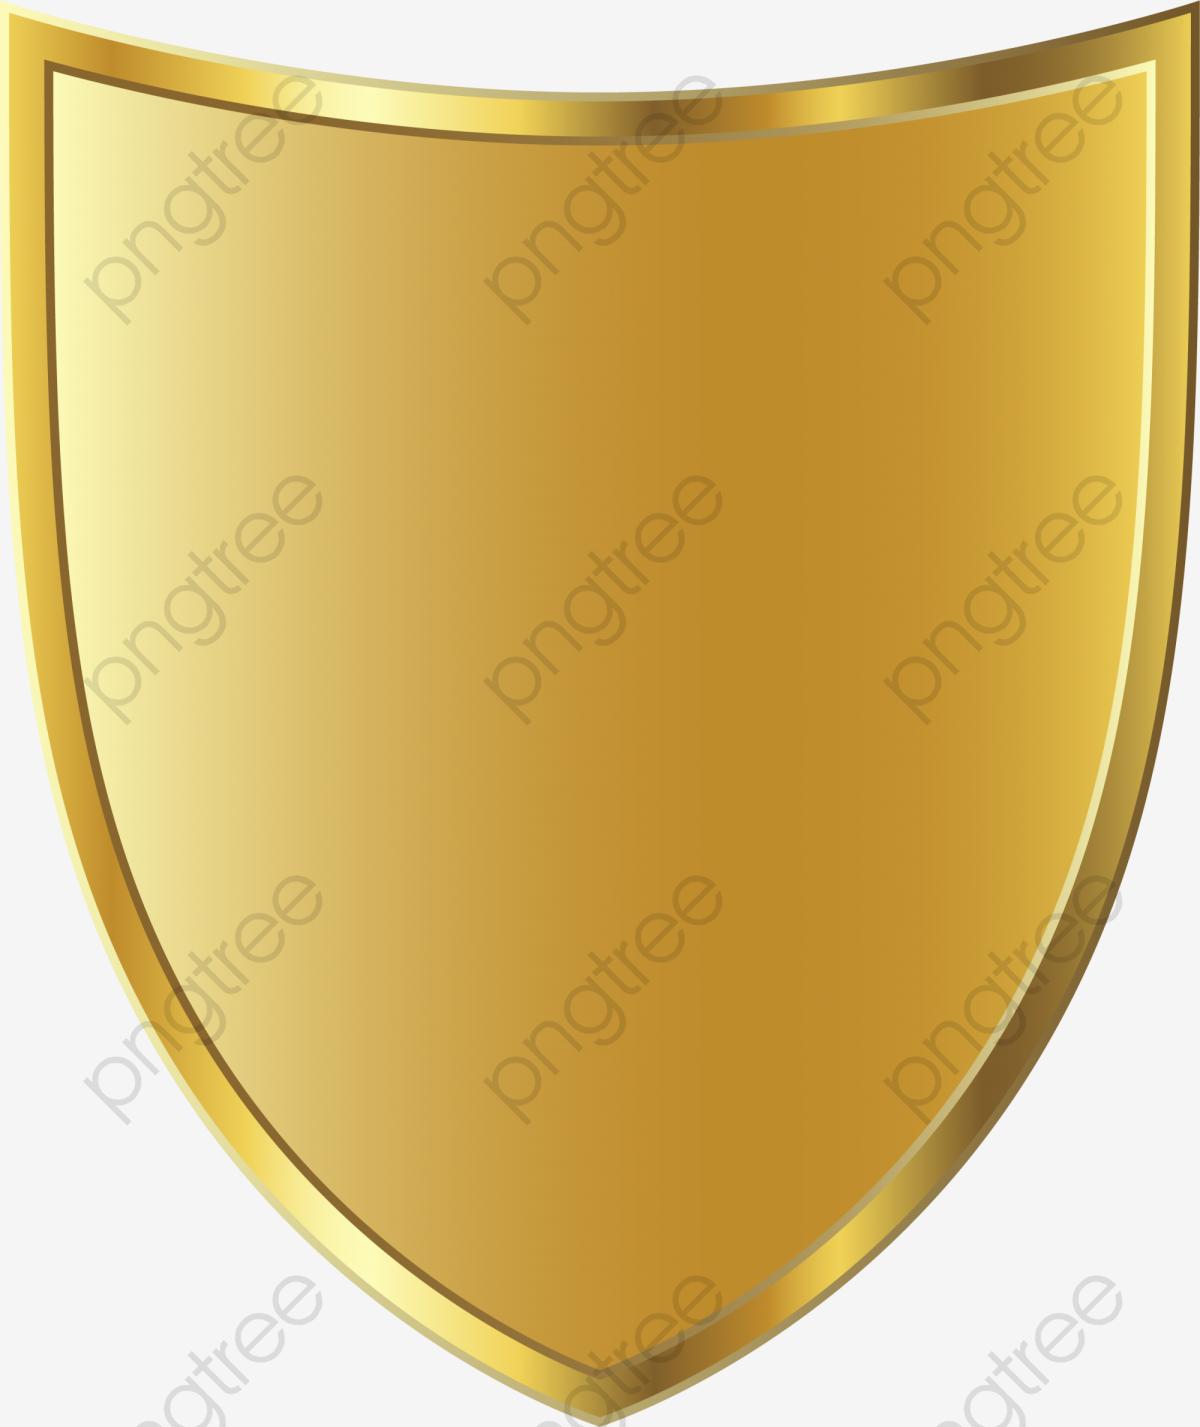 Golden Shield Badge, Shield Clipart, Golden, Shield PNG Transparent.